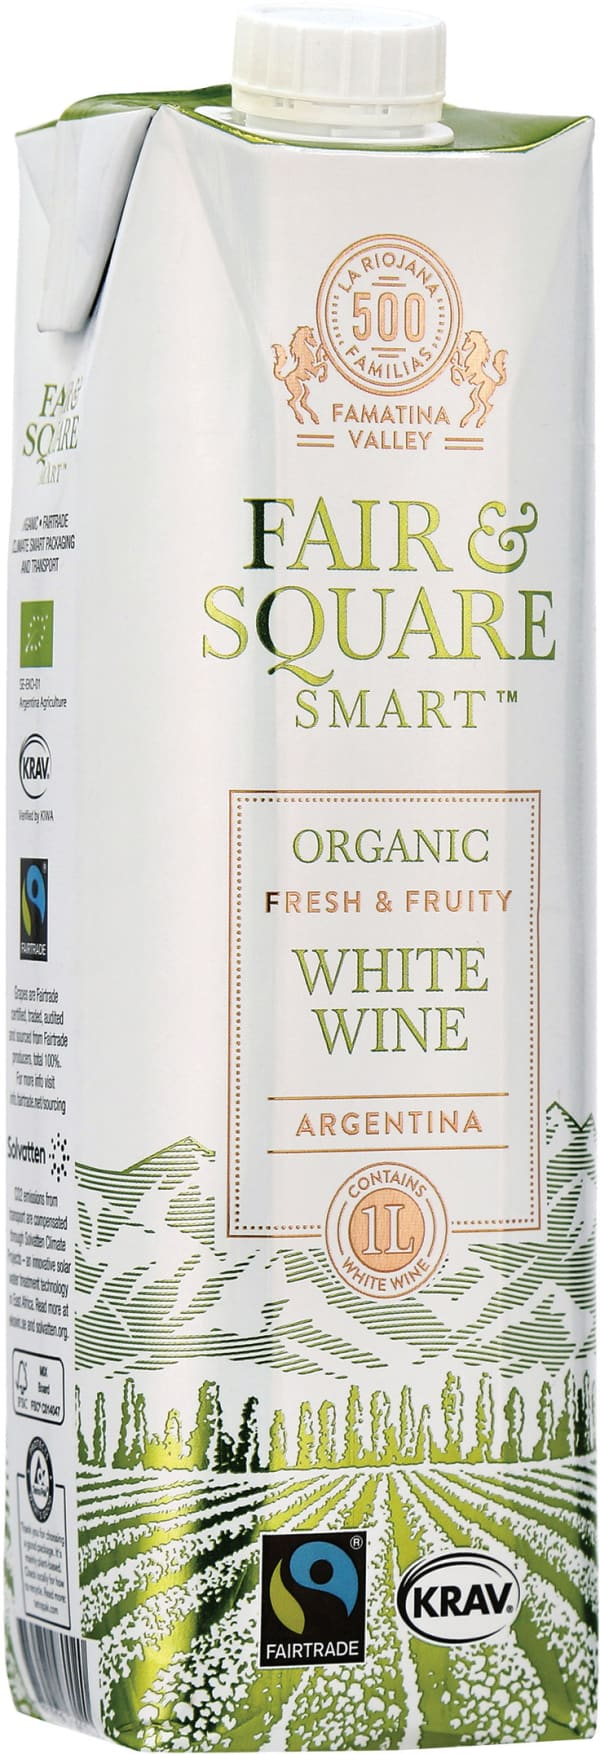 Fair & Square White 2018 kartongförpackning